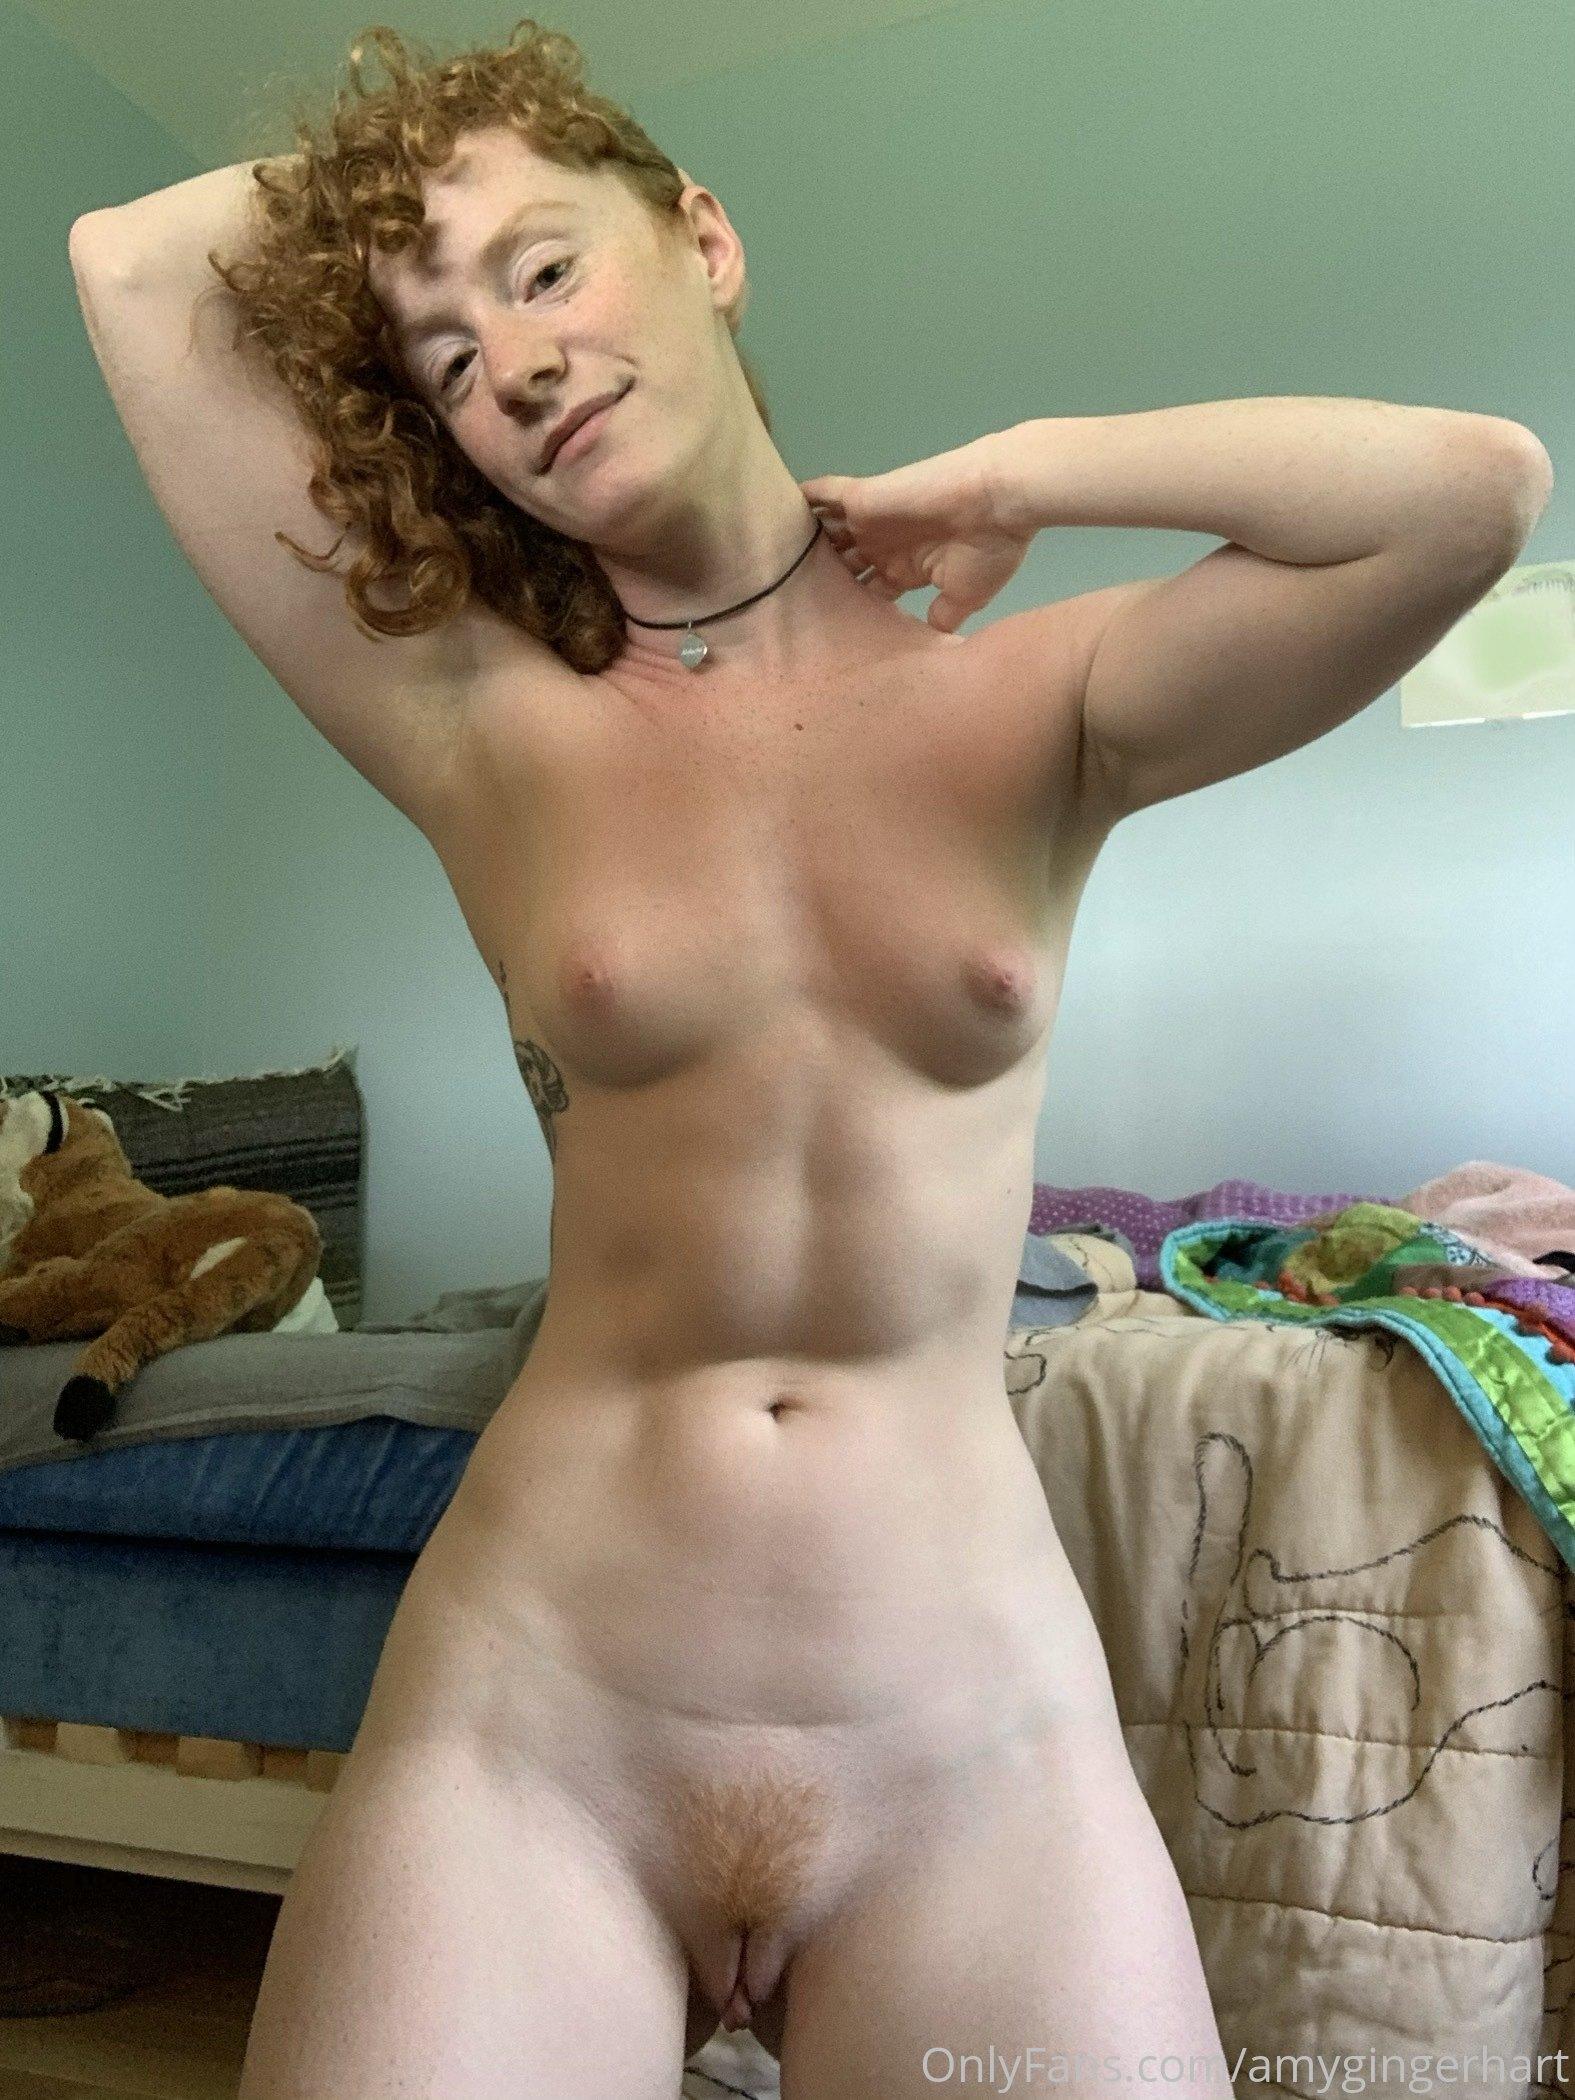 Amy Hart, Amygingerhart, Onlyfans 0248